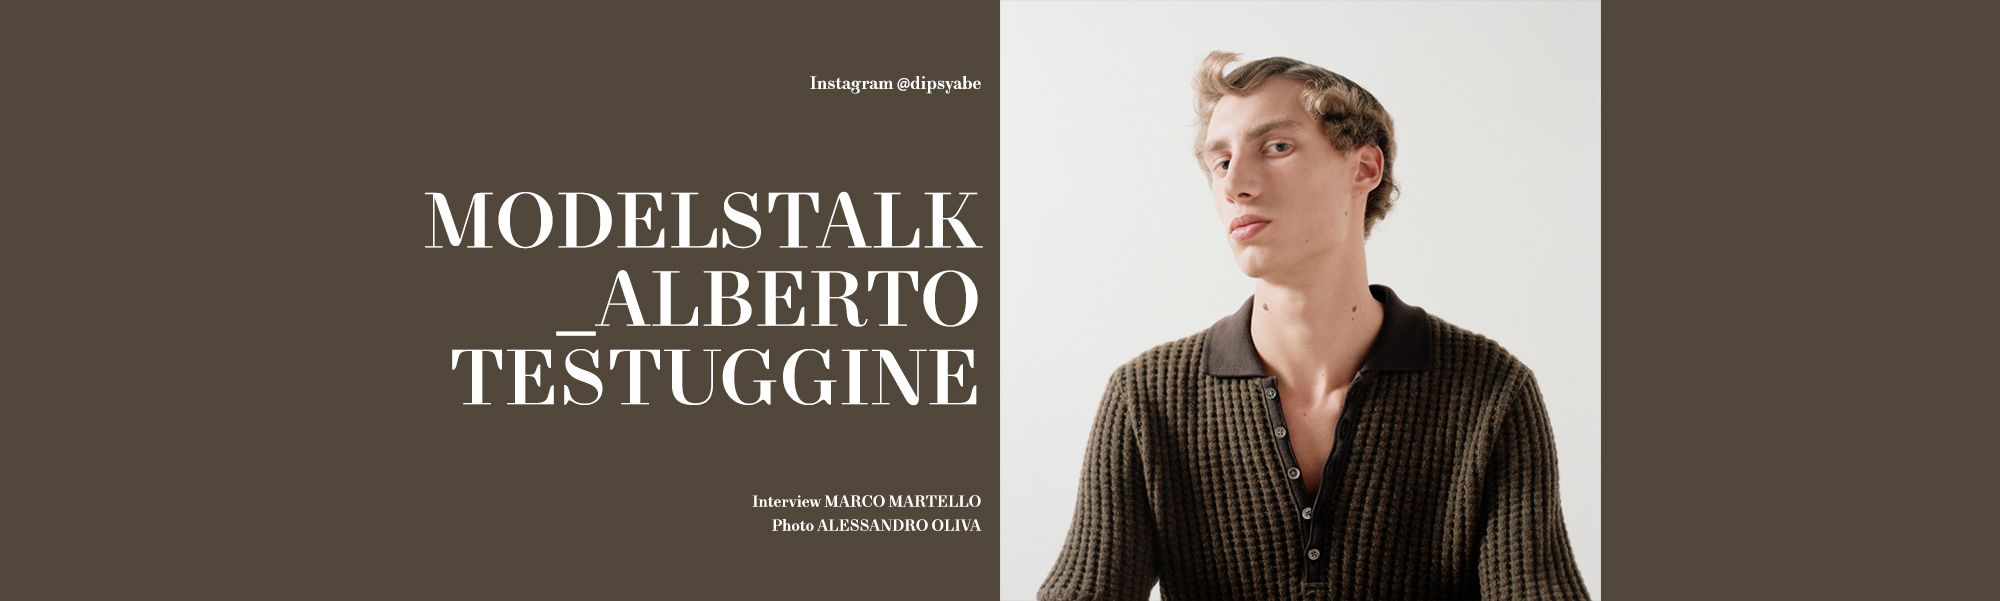 alberto-testuggine-thegreatestmagazine-talking heads-banner